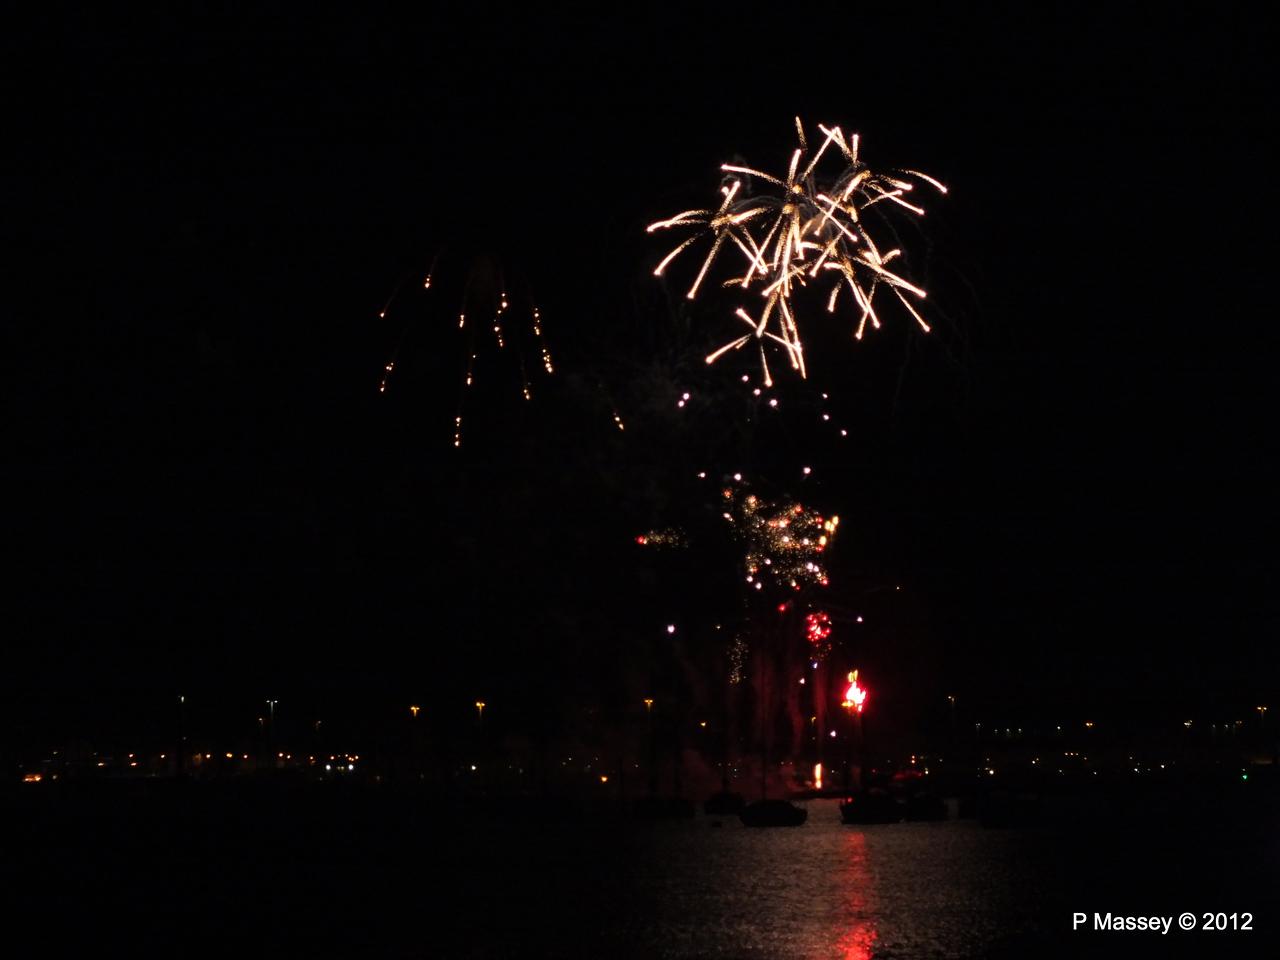 Fireworks off Mayflower Park PDM 03-11-2012 20-43-12